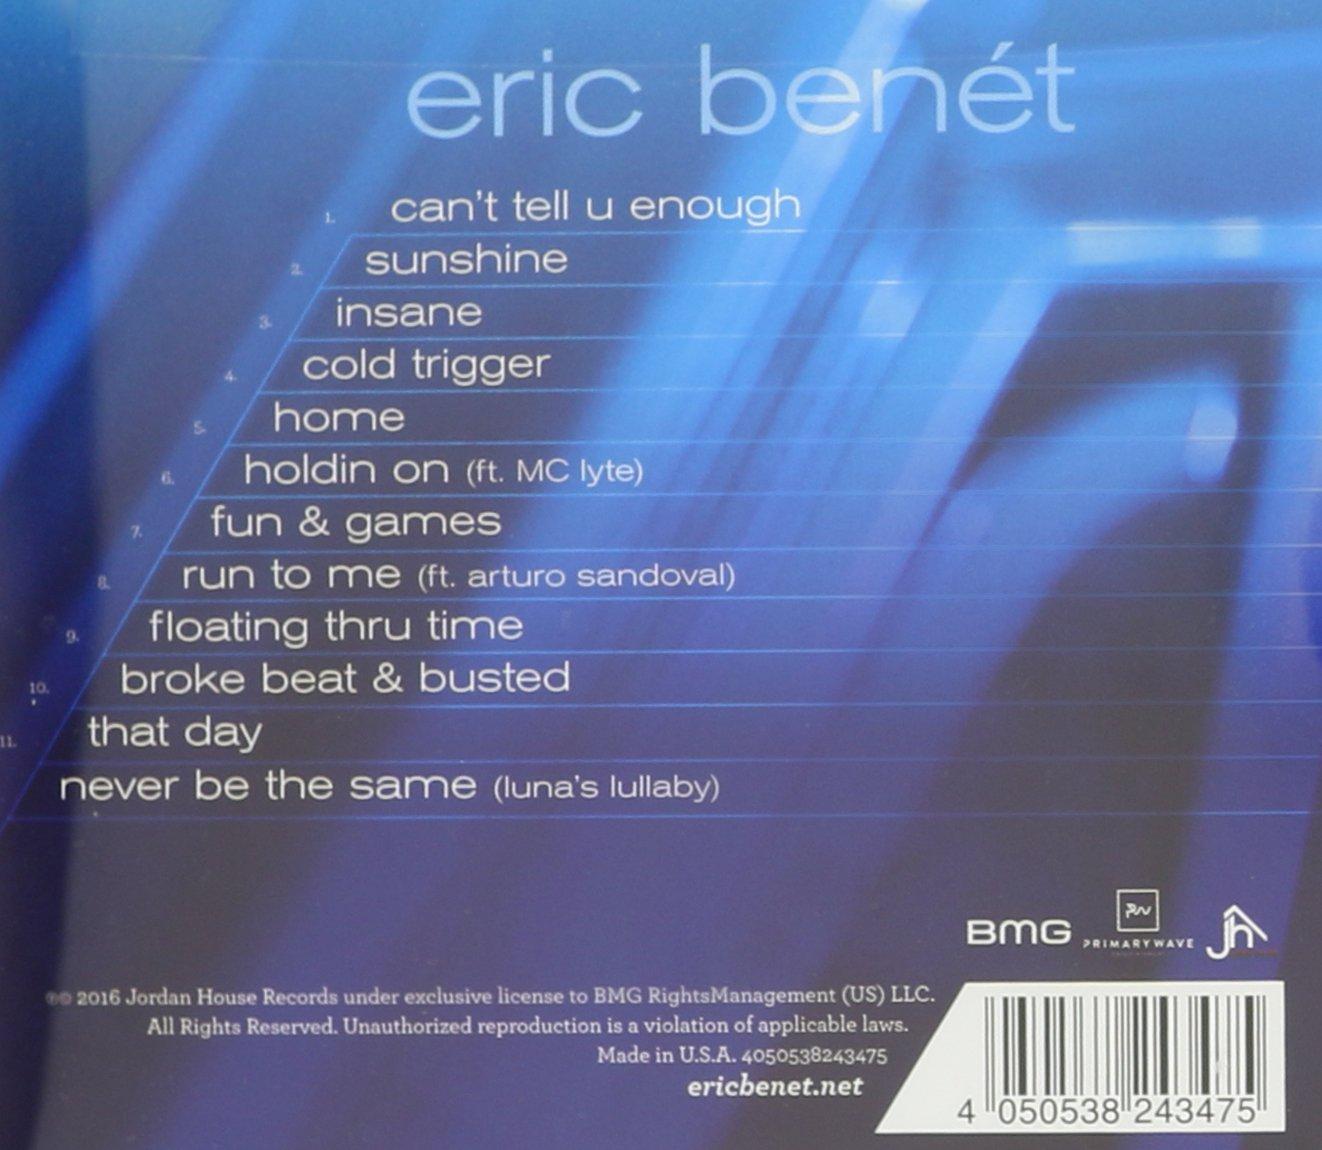 eric benet hurricane album download